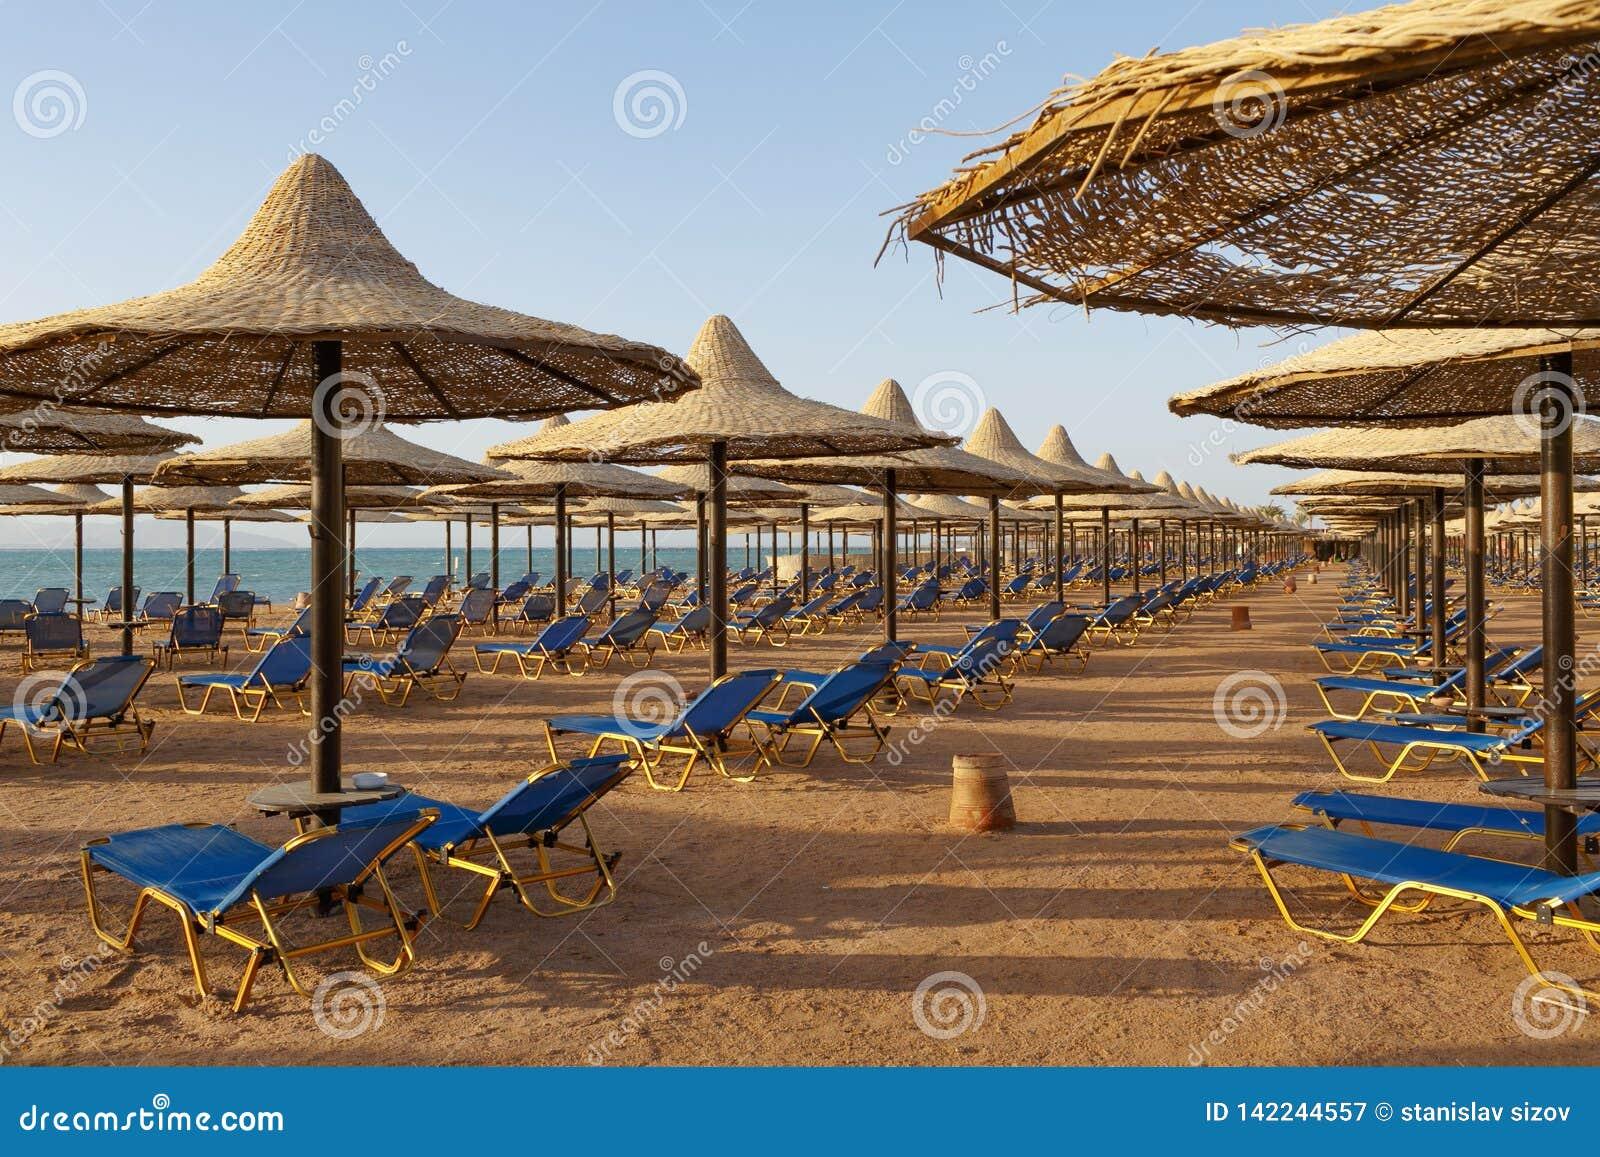 Beach with sunbeds under the straw beach umbrellas on the seashore